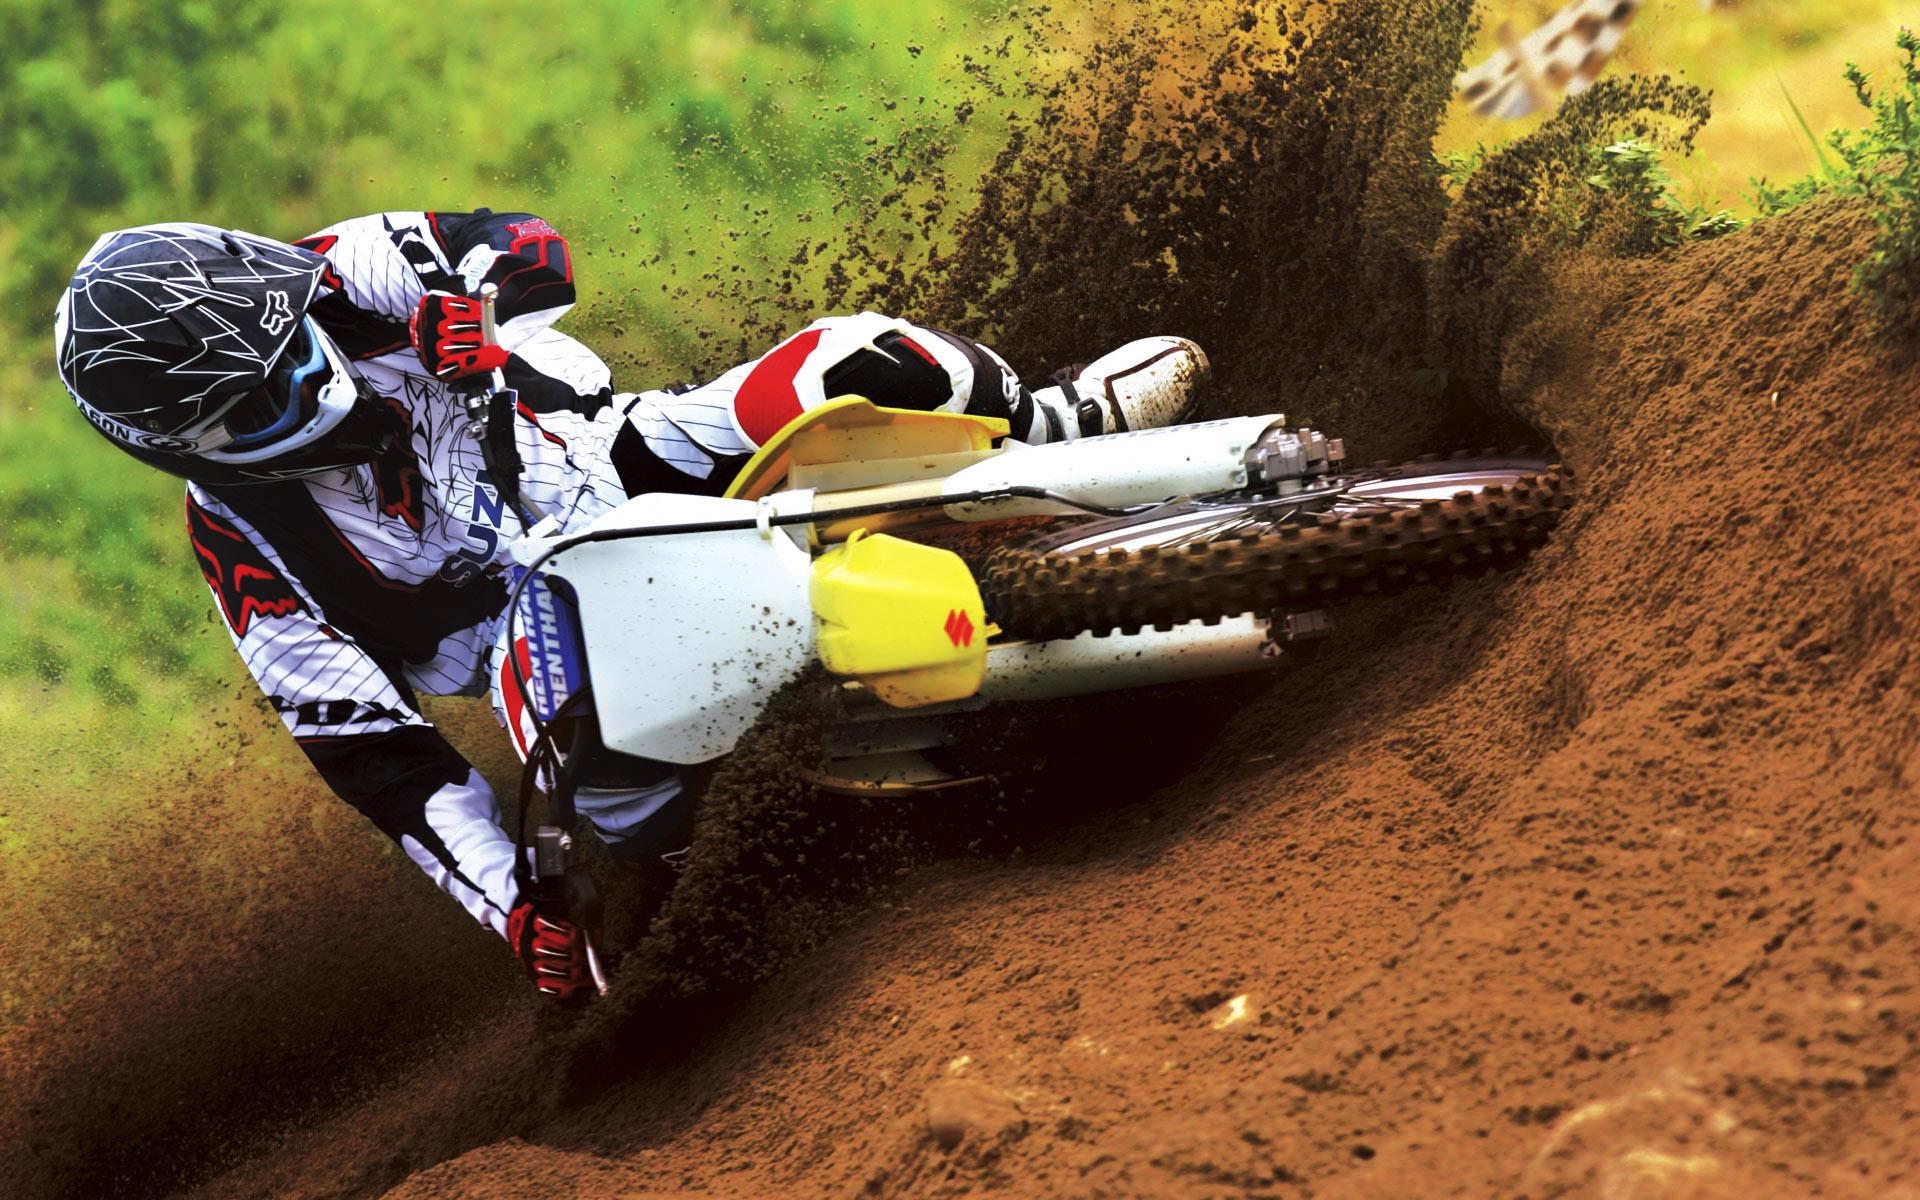 Wallpaper HD Moto Cross   Taringa 1920x1200